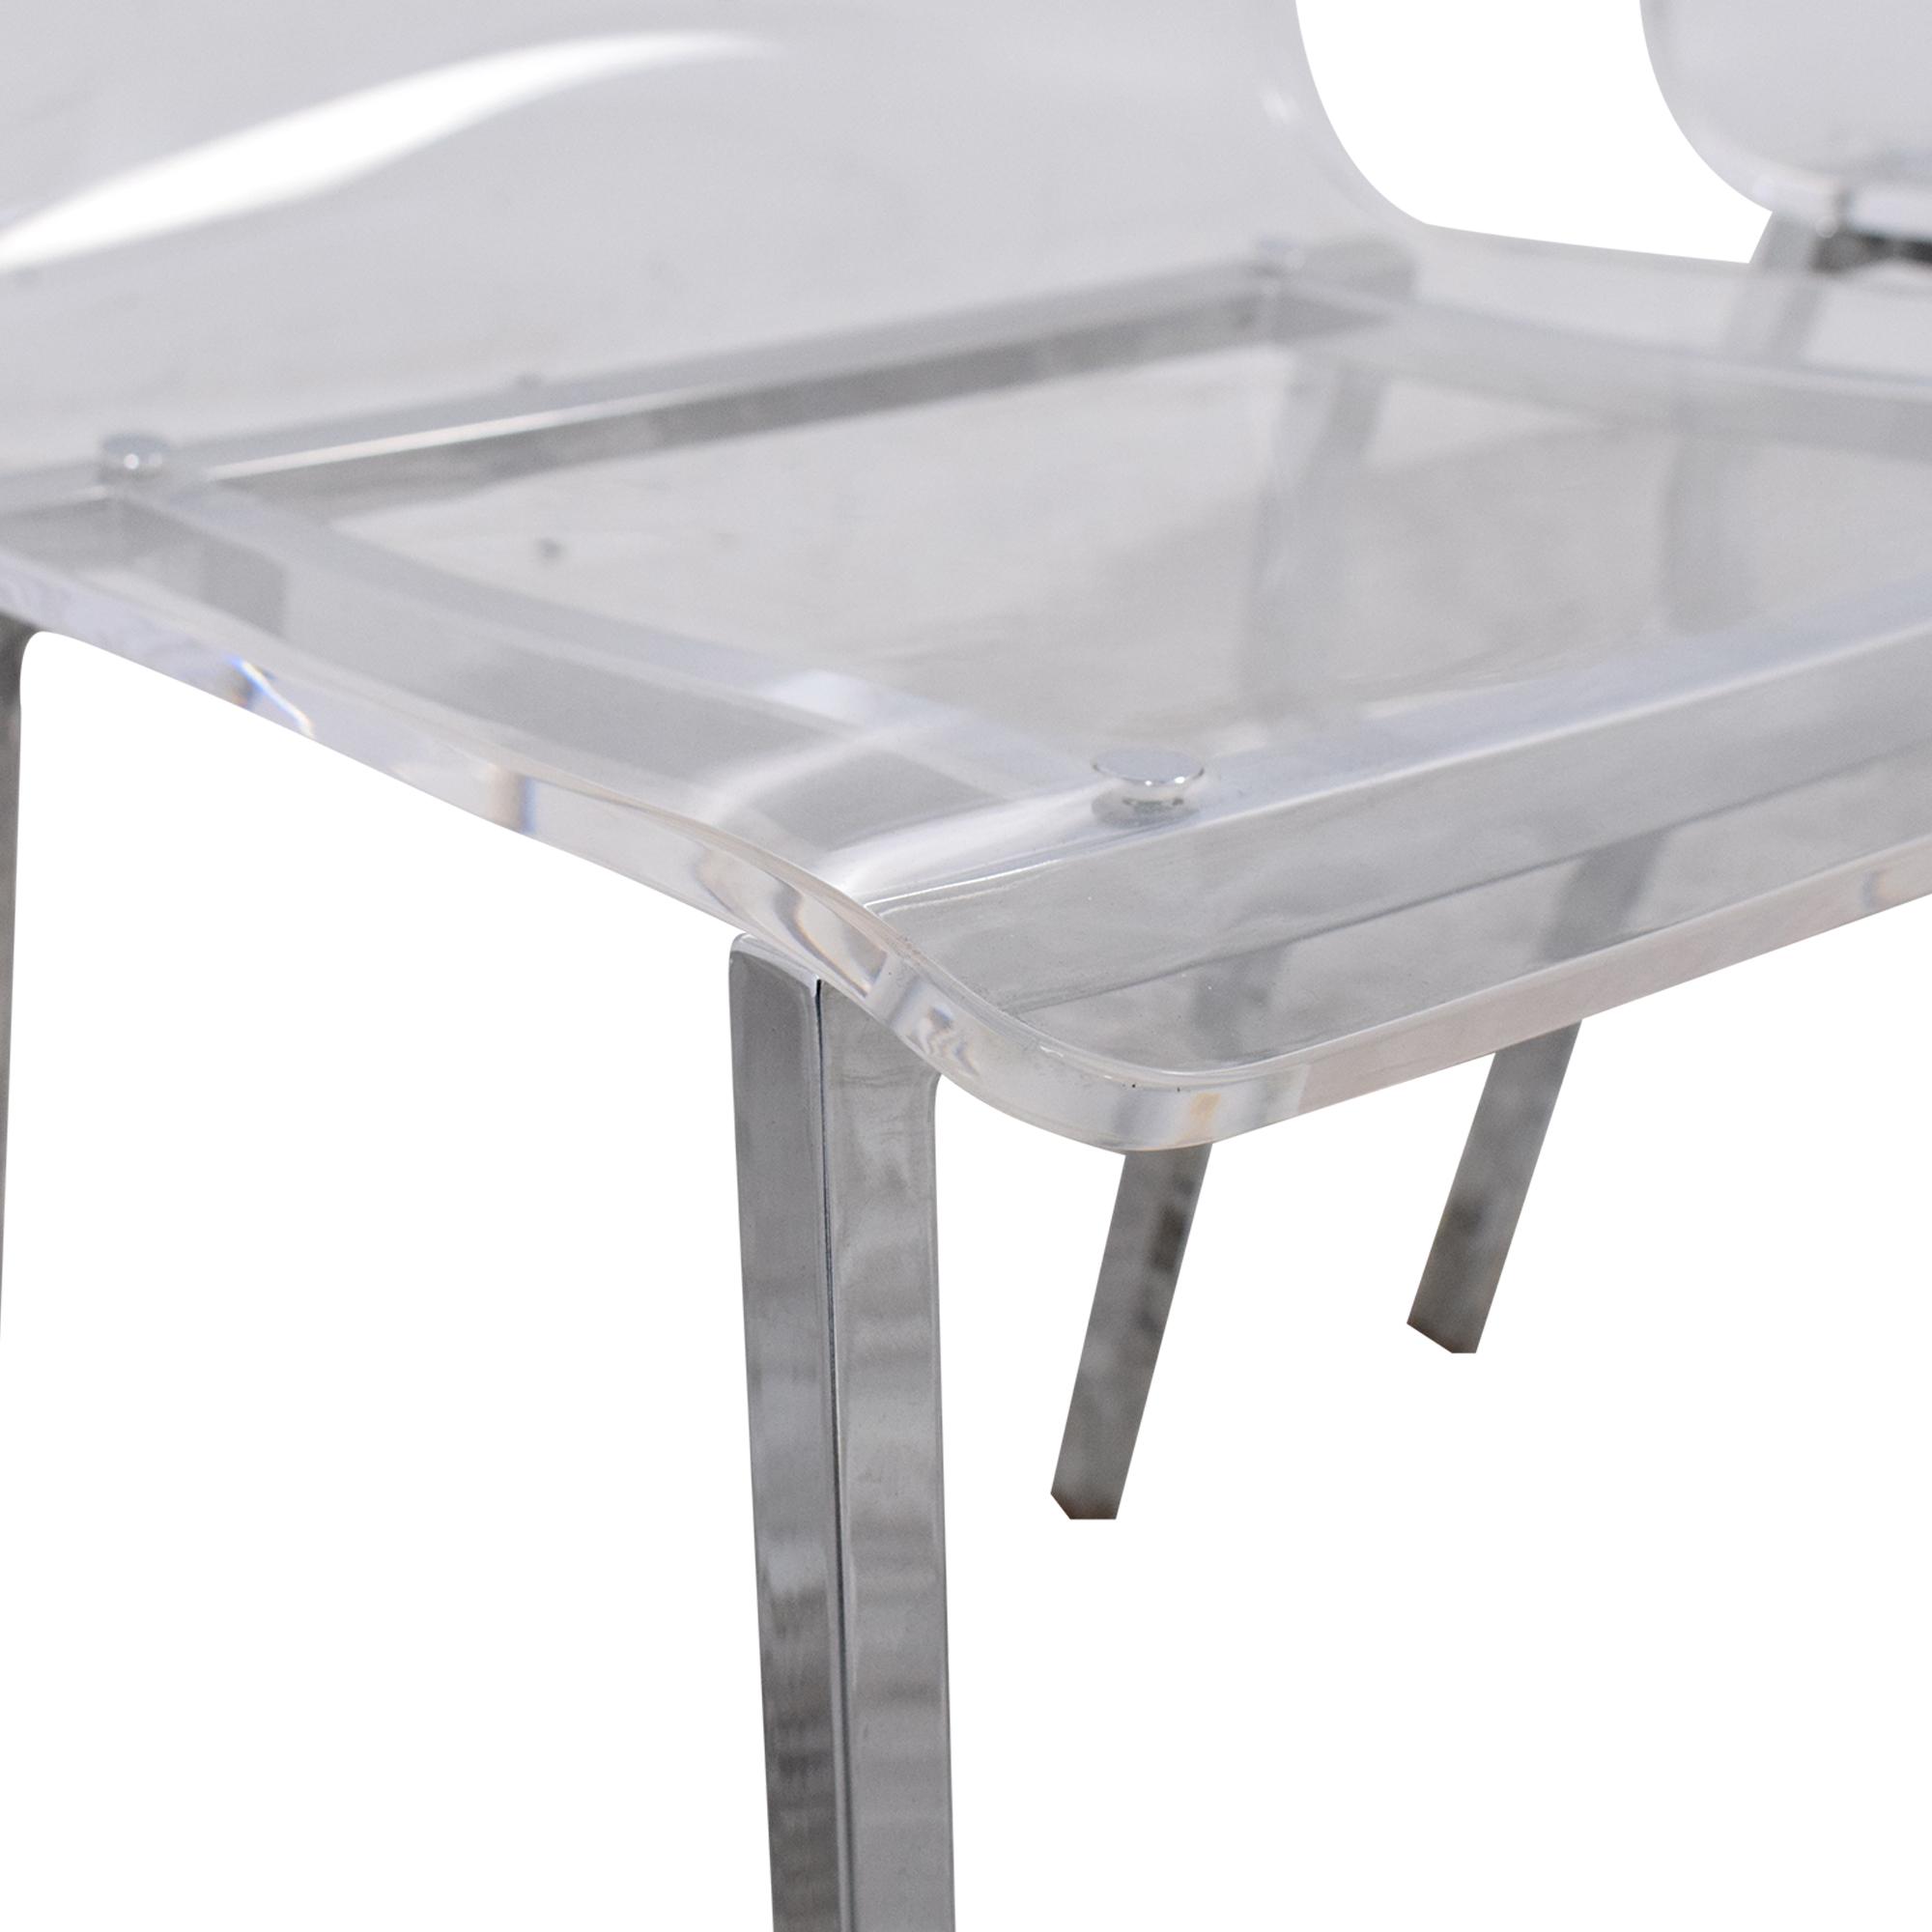 CB2 CB2 Vapor Acrylic Clear Dining Room Chairs ma